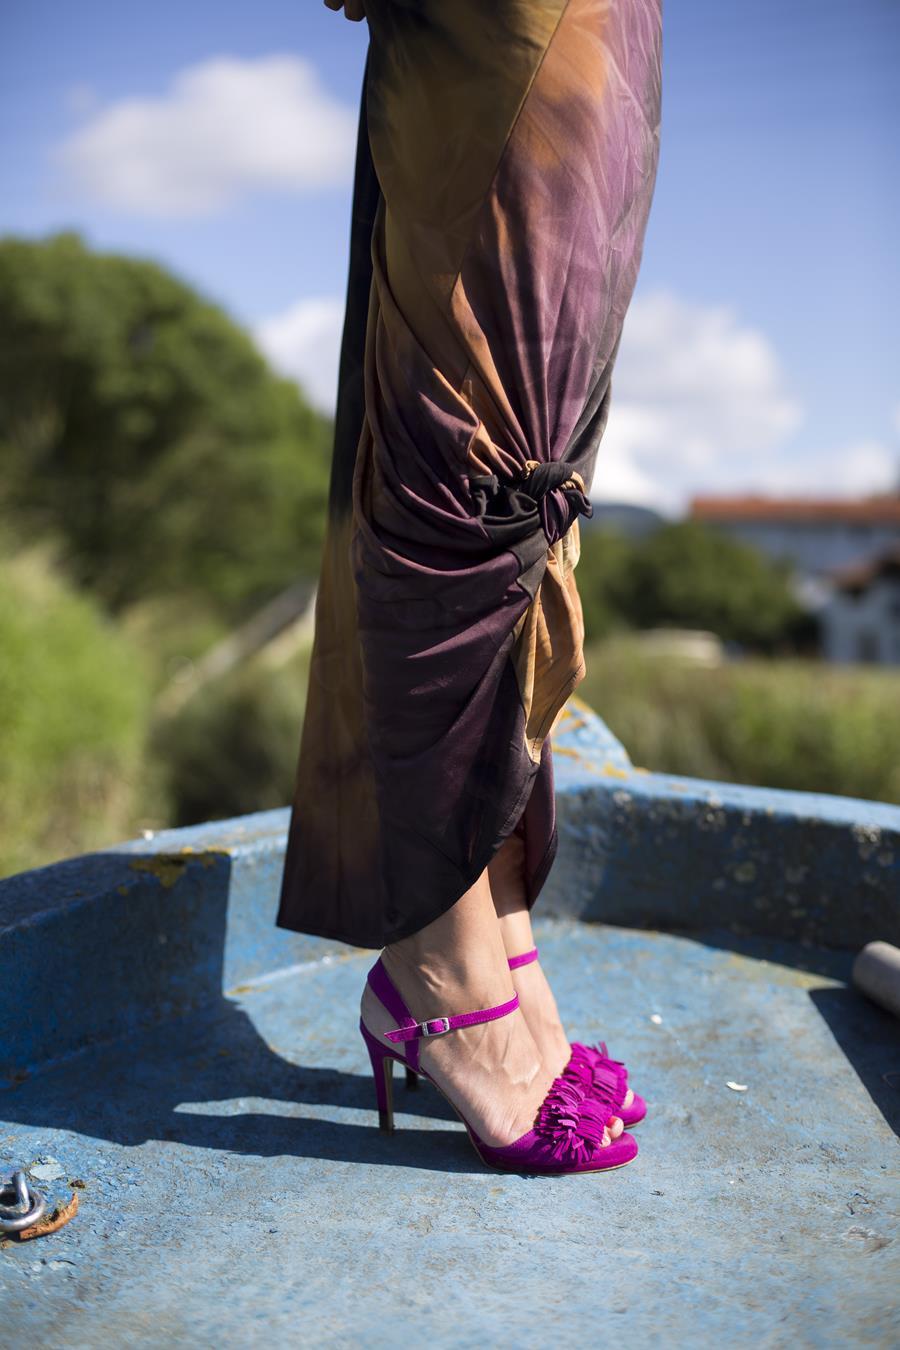 Rebeca Valdivia, asesora de imagen, personal shopper, estilista, stilist, influencer, la blogger indie, Donostia, San Sebastián, Miss Clov, maxi dress, vestido largo, tie dye, afro, turbante, sandalias de tacón, heels, sandals, maxi earings, maxi vestido, mini bag, bolso bandolera, clutch, la blogger indie, influencer